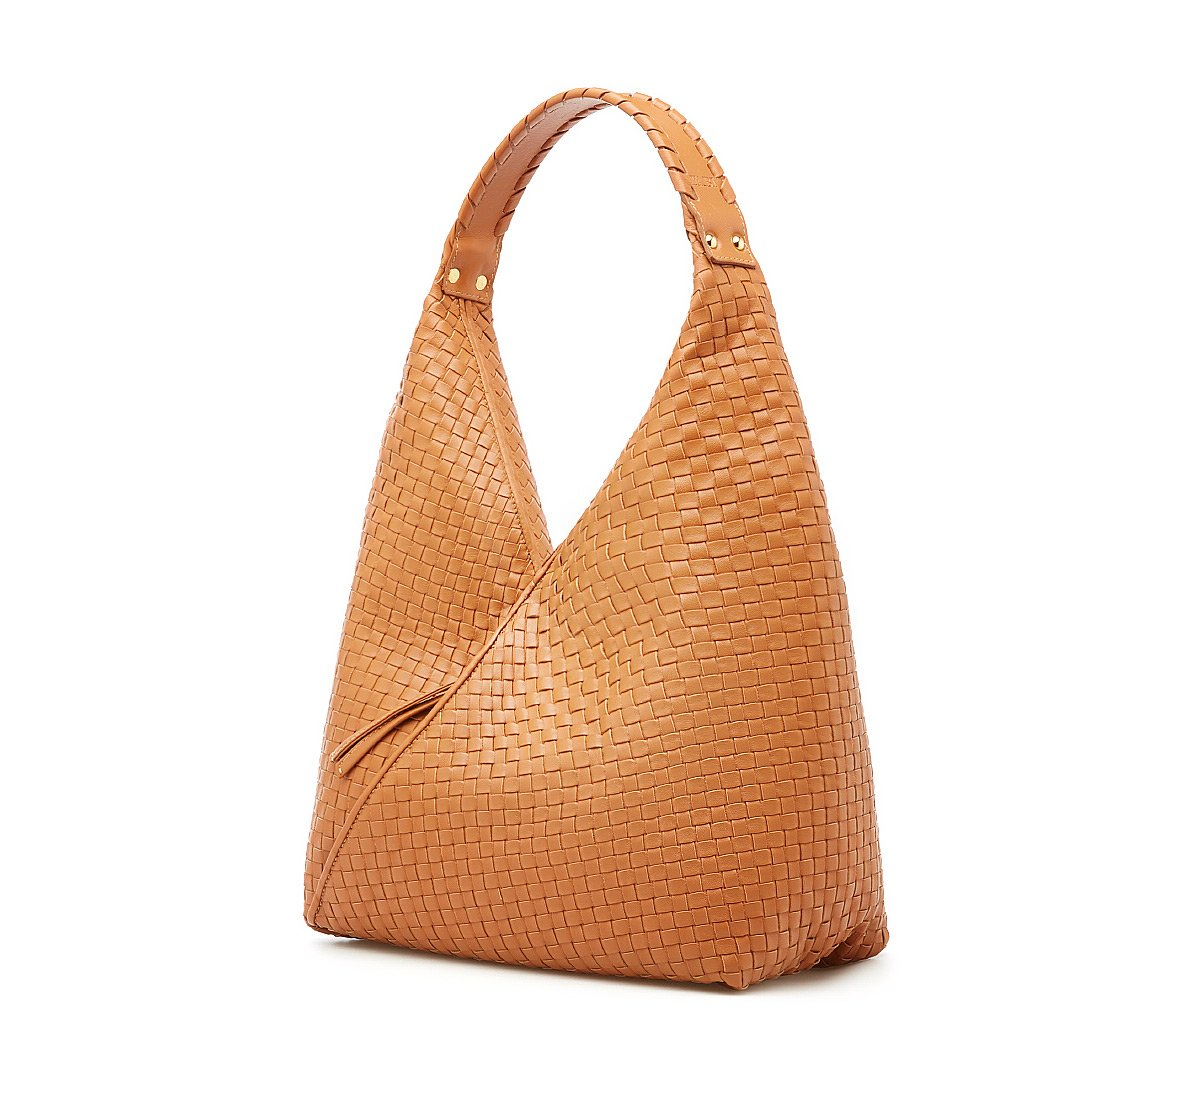 Shopper bag in calfskin